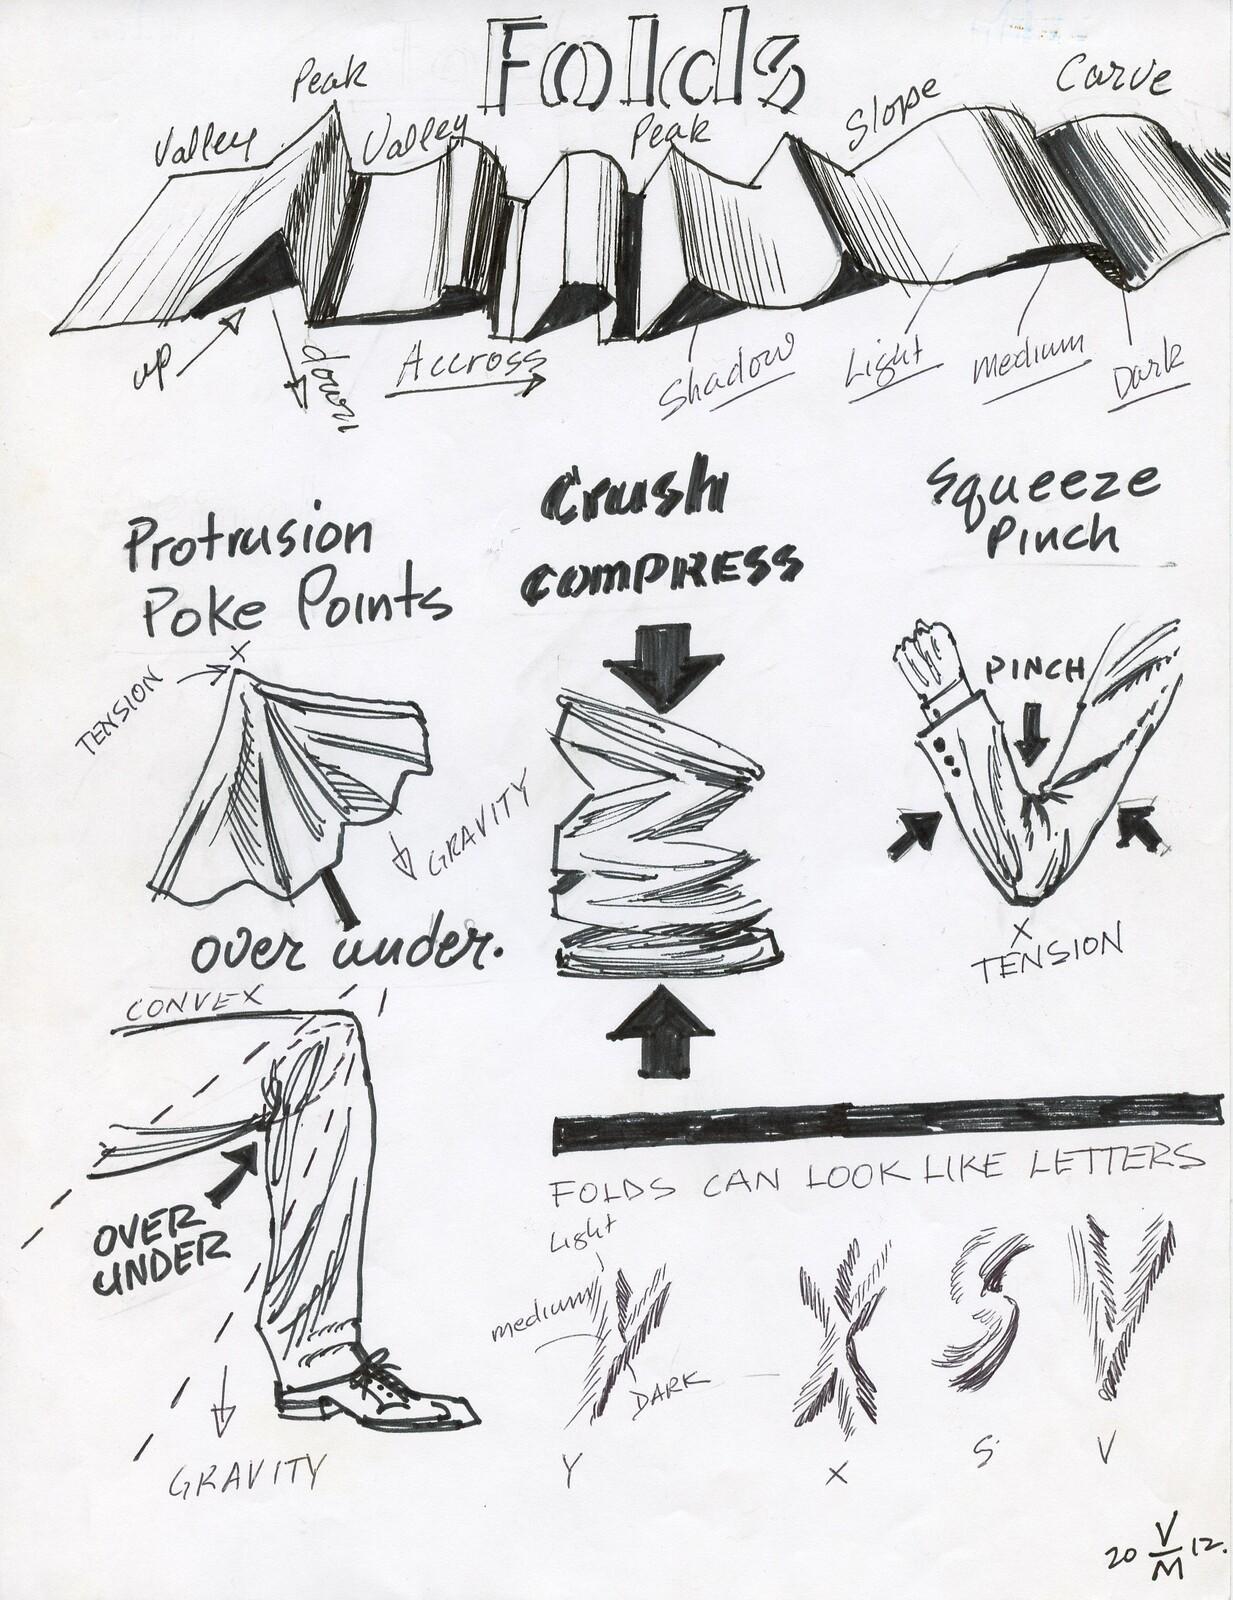 The anatomy of folds.